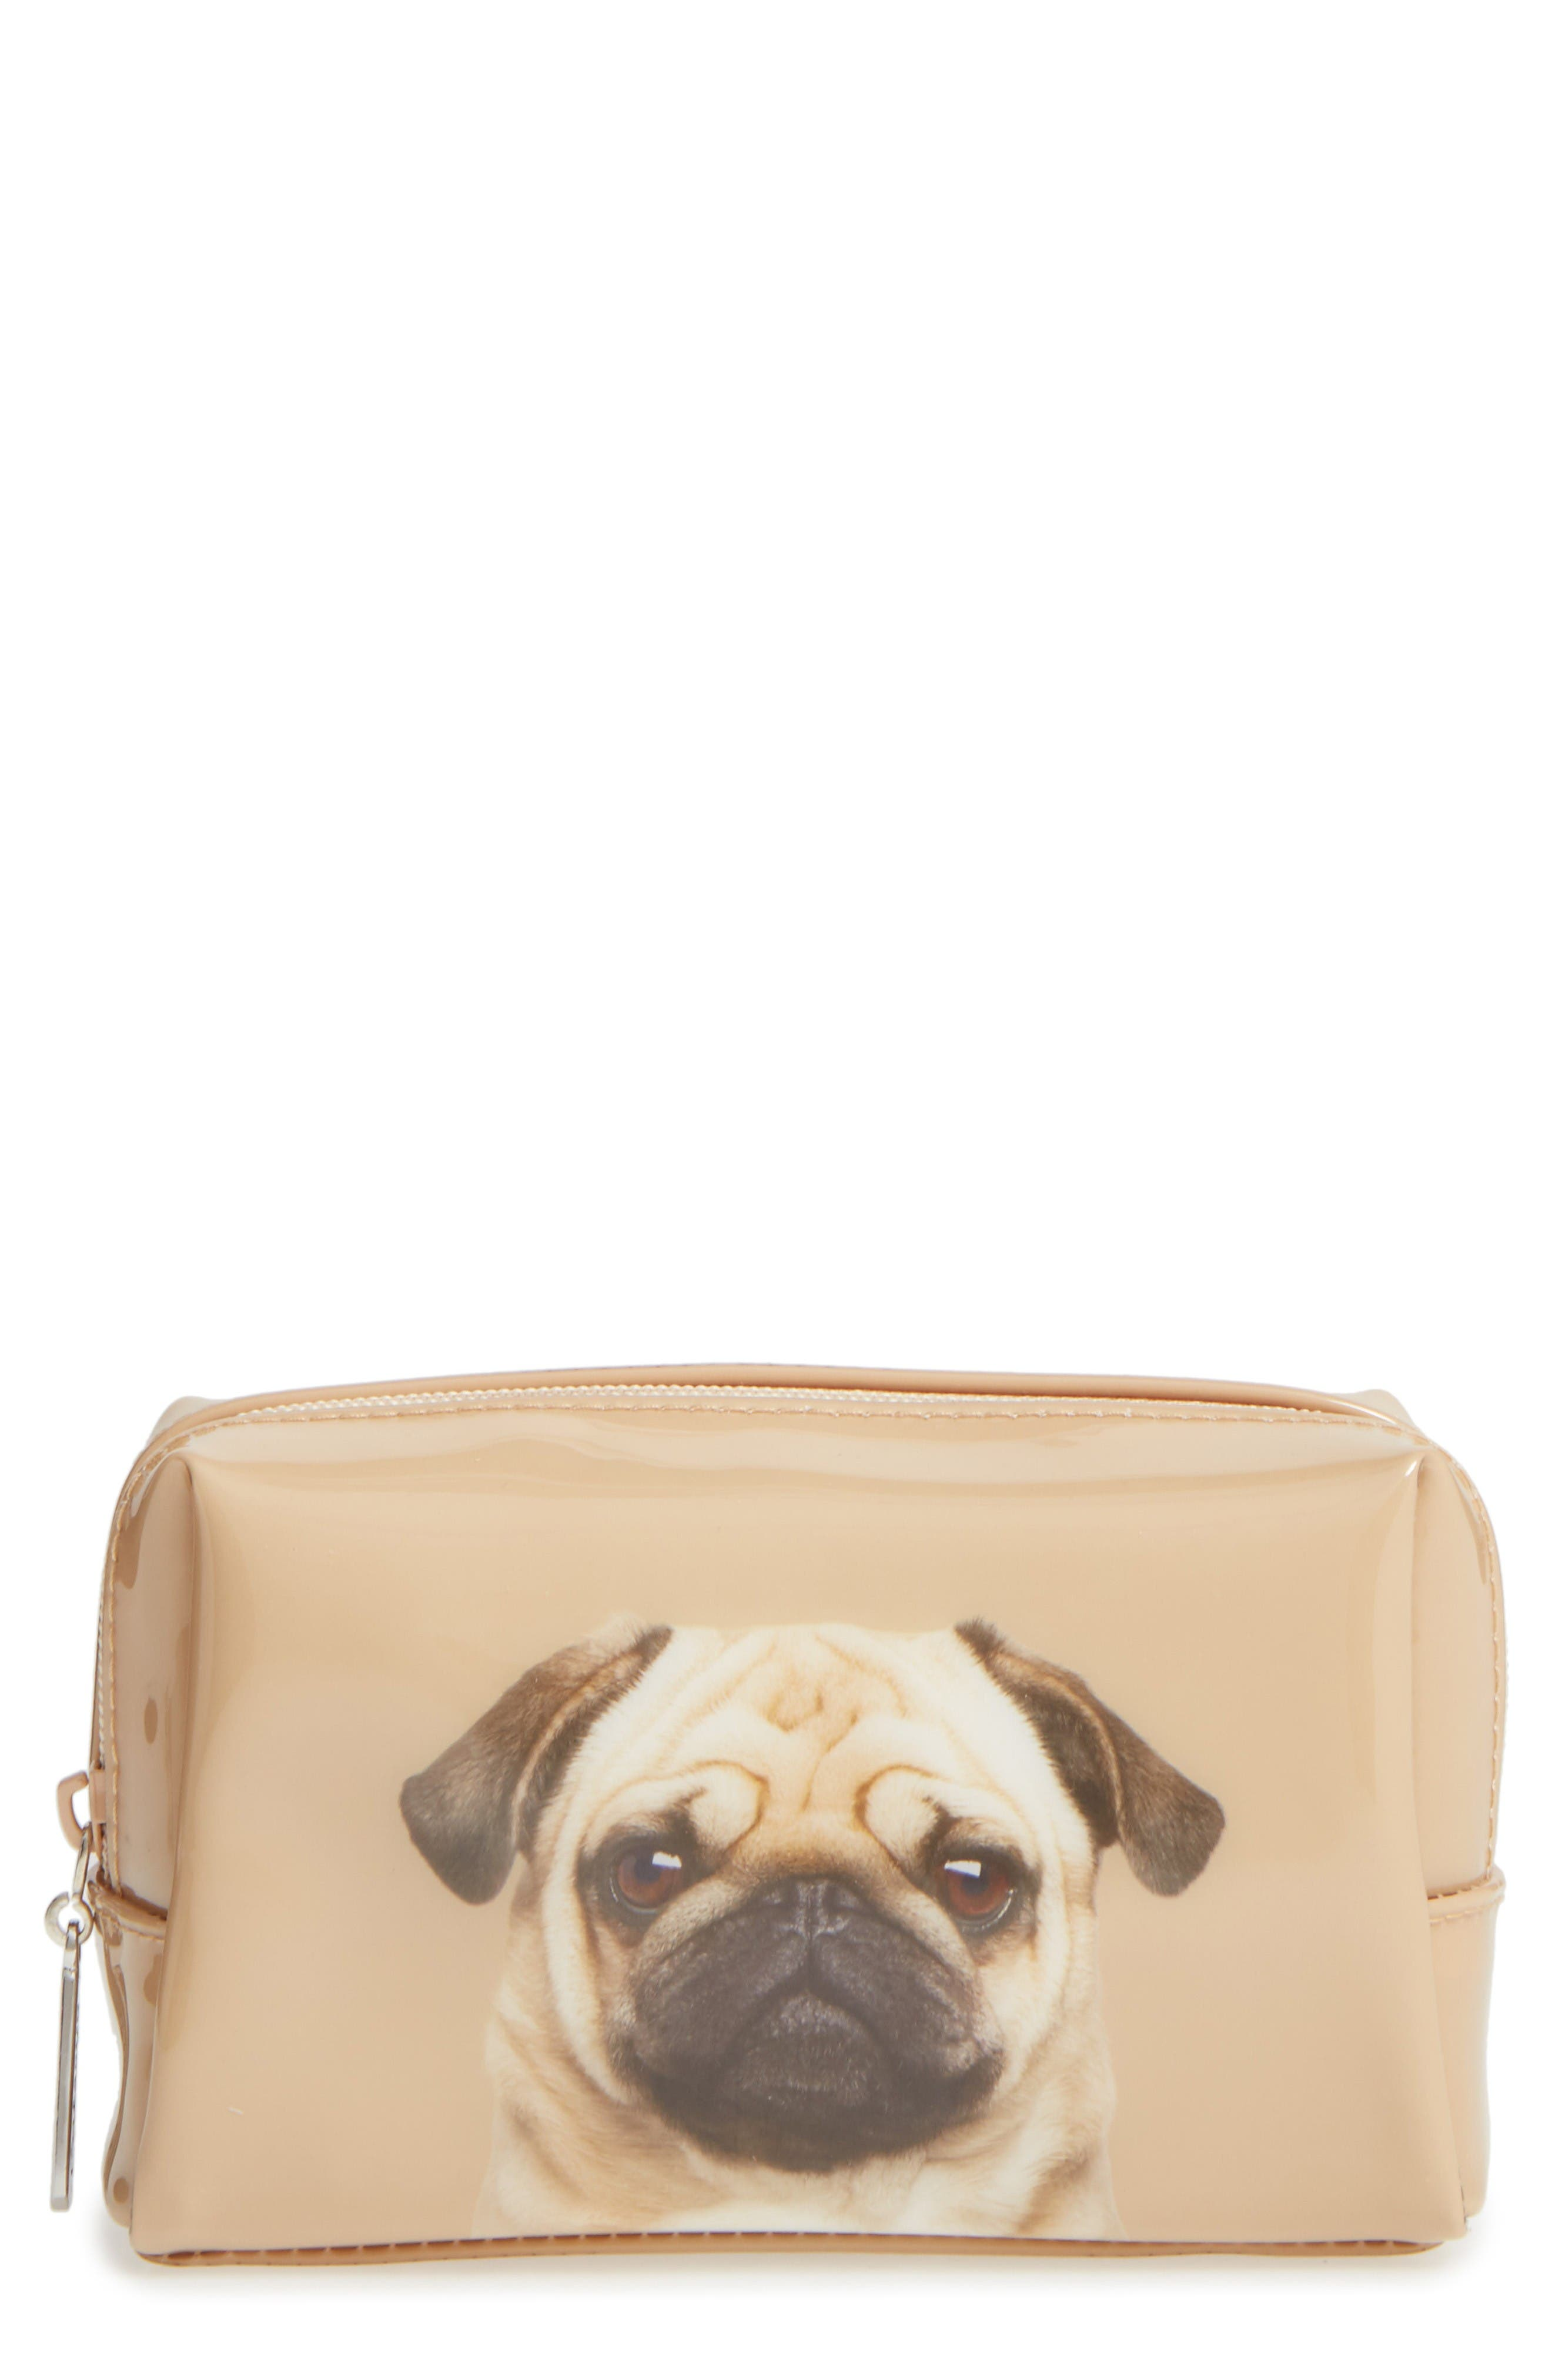 Caramel Pug Cosmetics Case,                         Main,                         color, Pug On Caramel